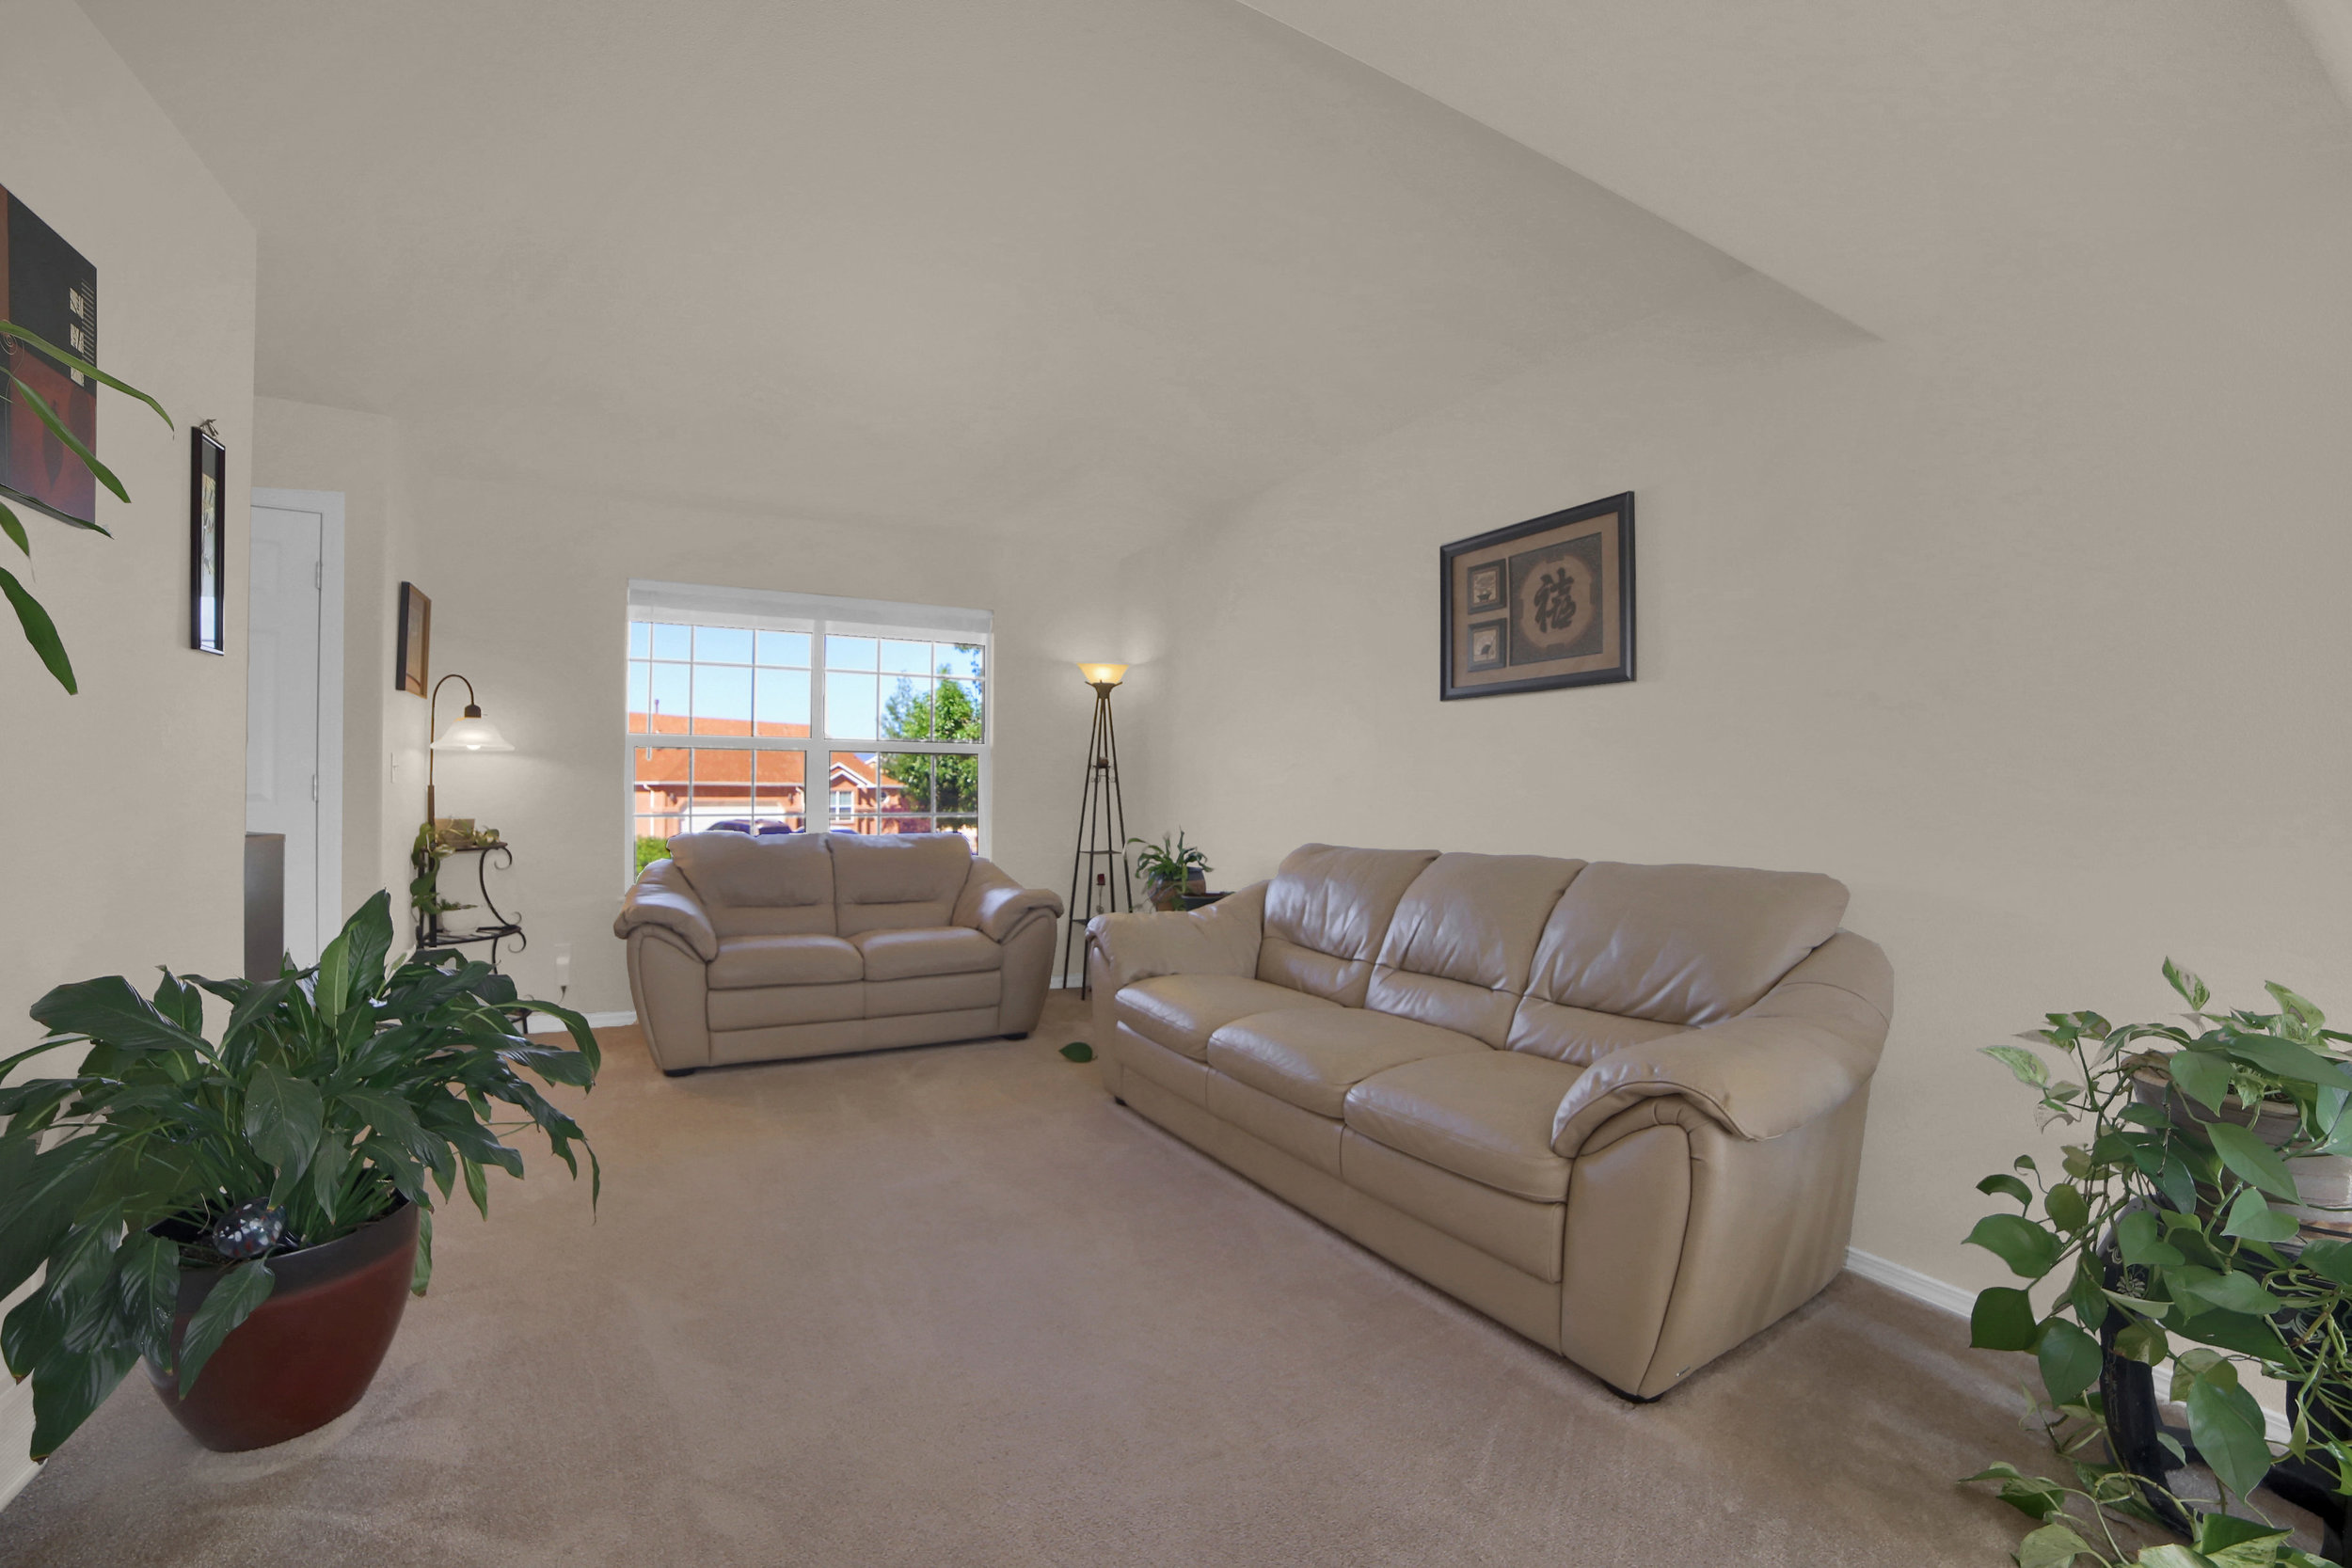 7414 Campstool Drive Colorado-print-007-007-Living Room-3648x2432-300dpi.jpg